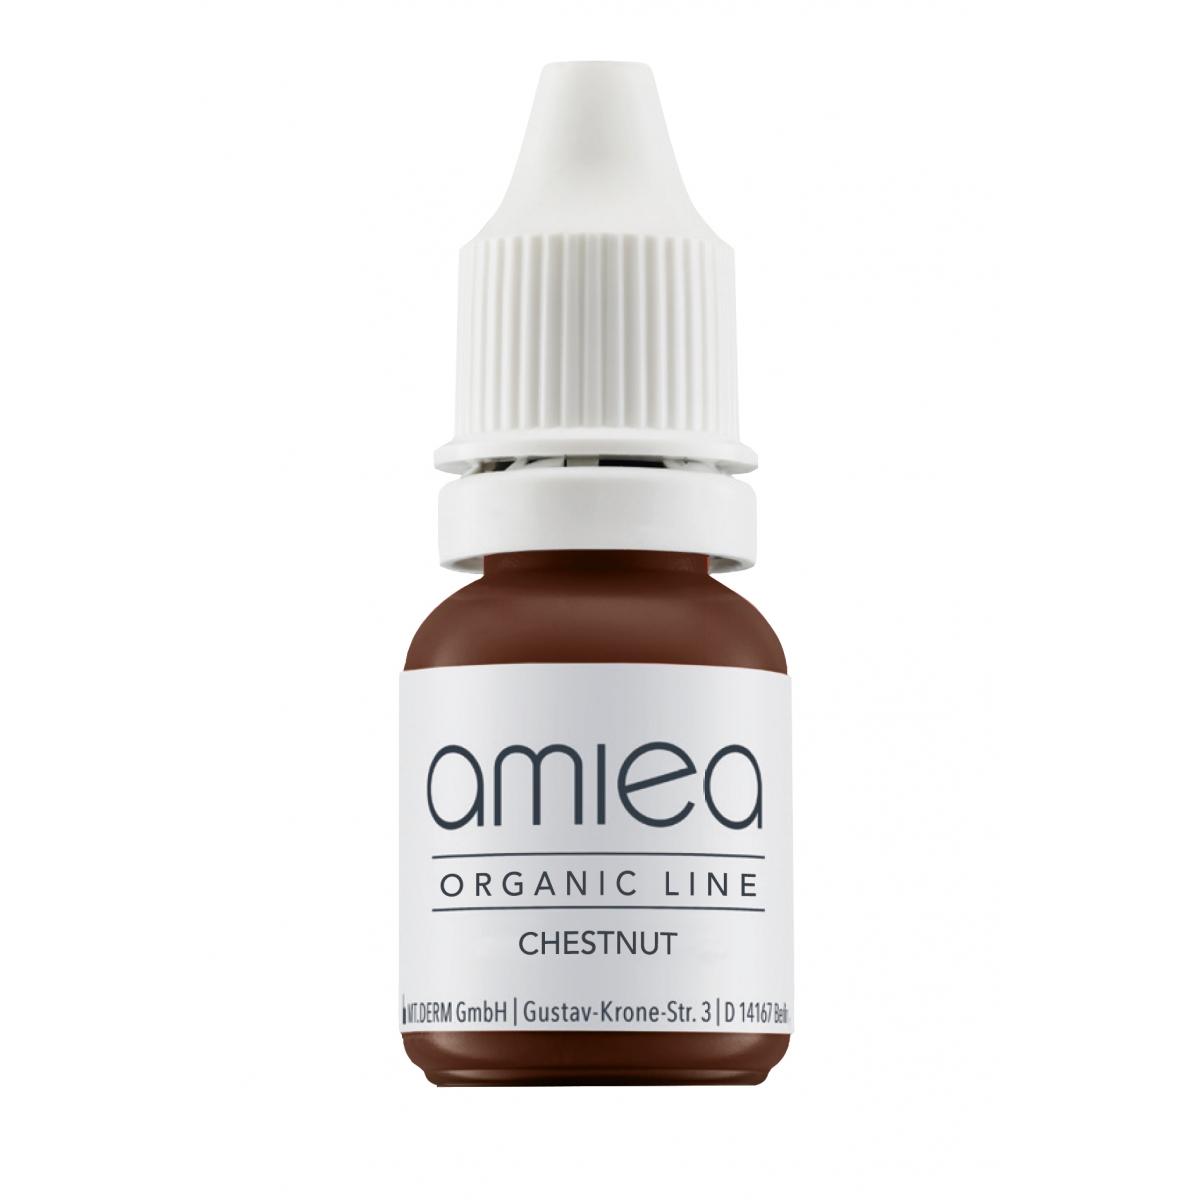 Organicline (5 ml)  - PIGMENTS AMIEA ORGANICLINE CHESTNUT, Flacon 5 ml